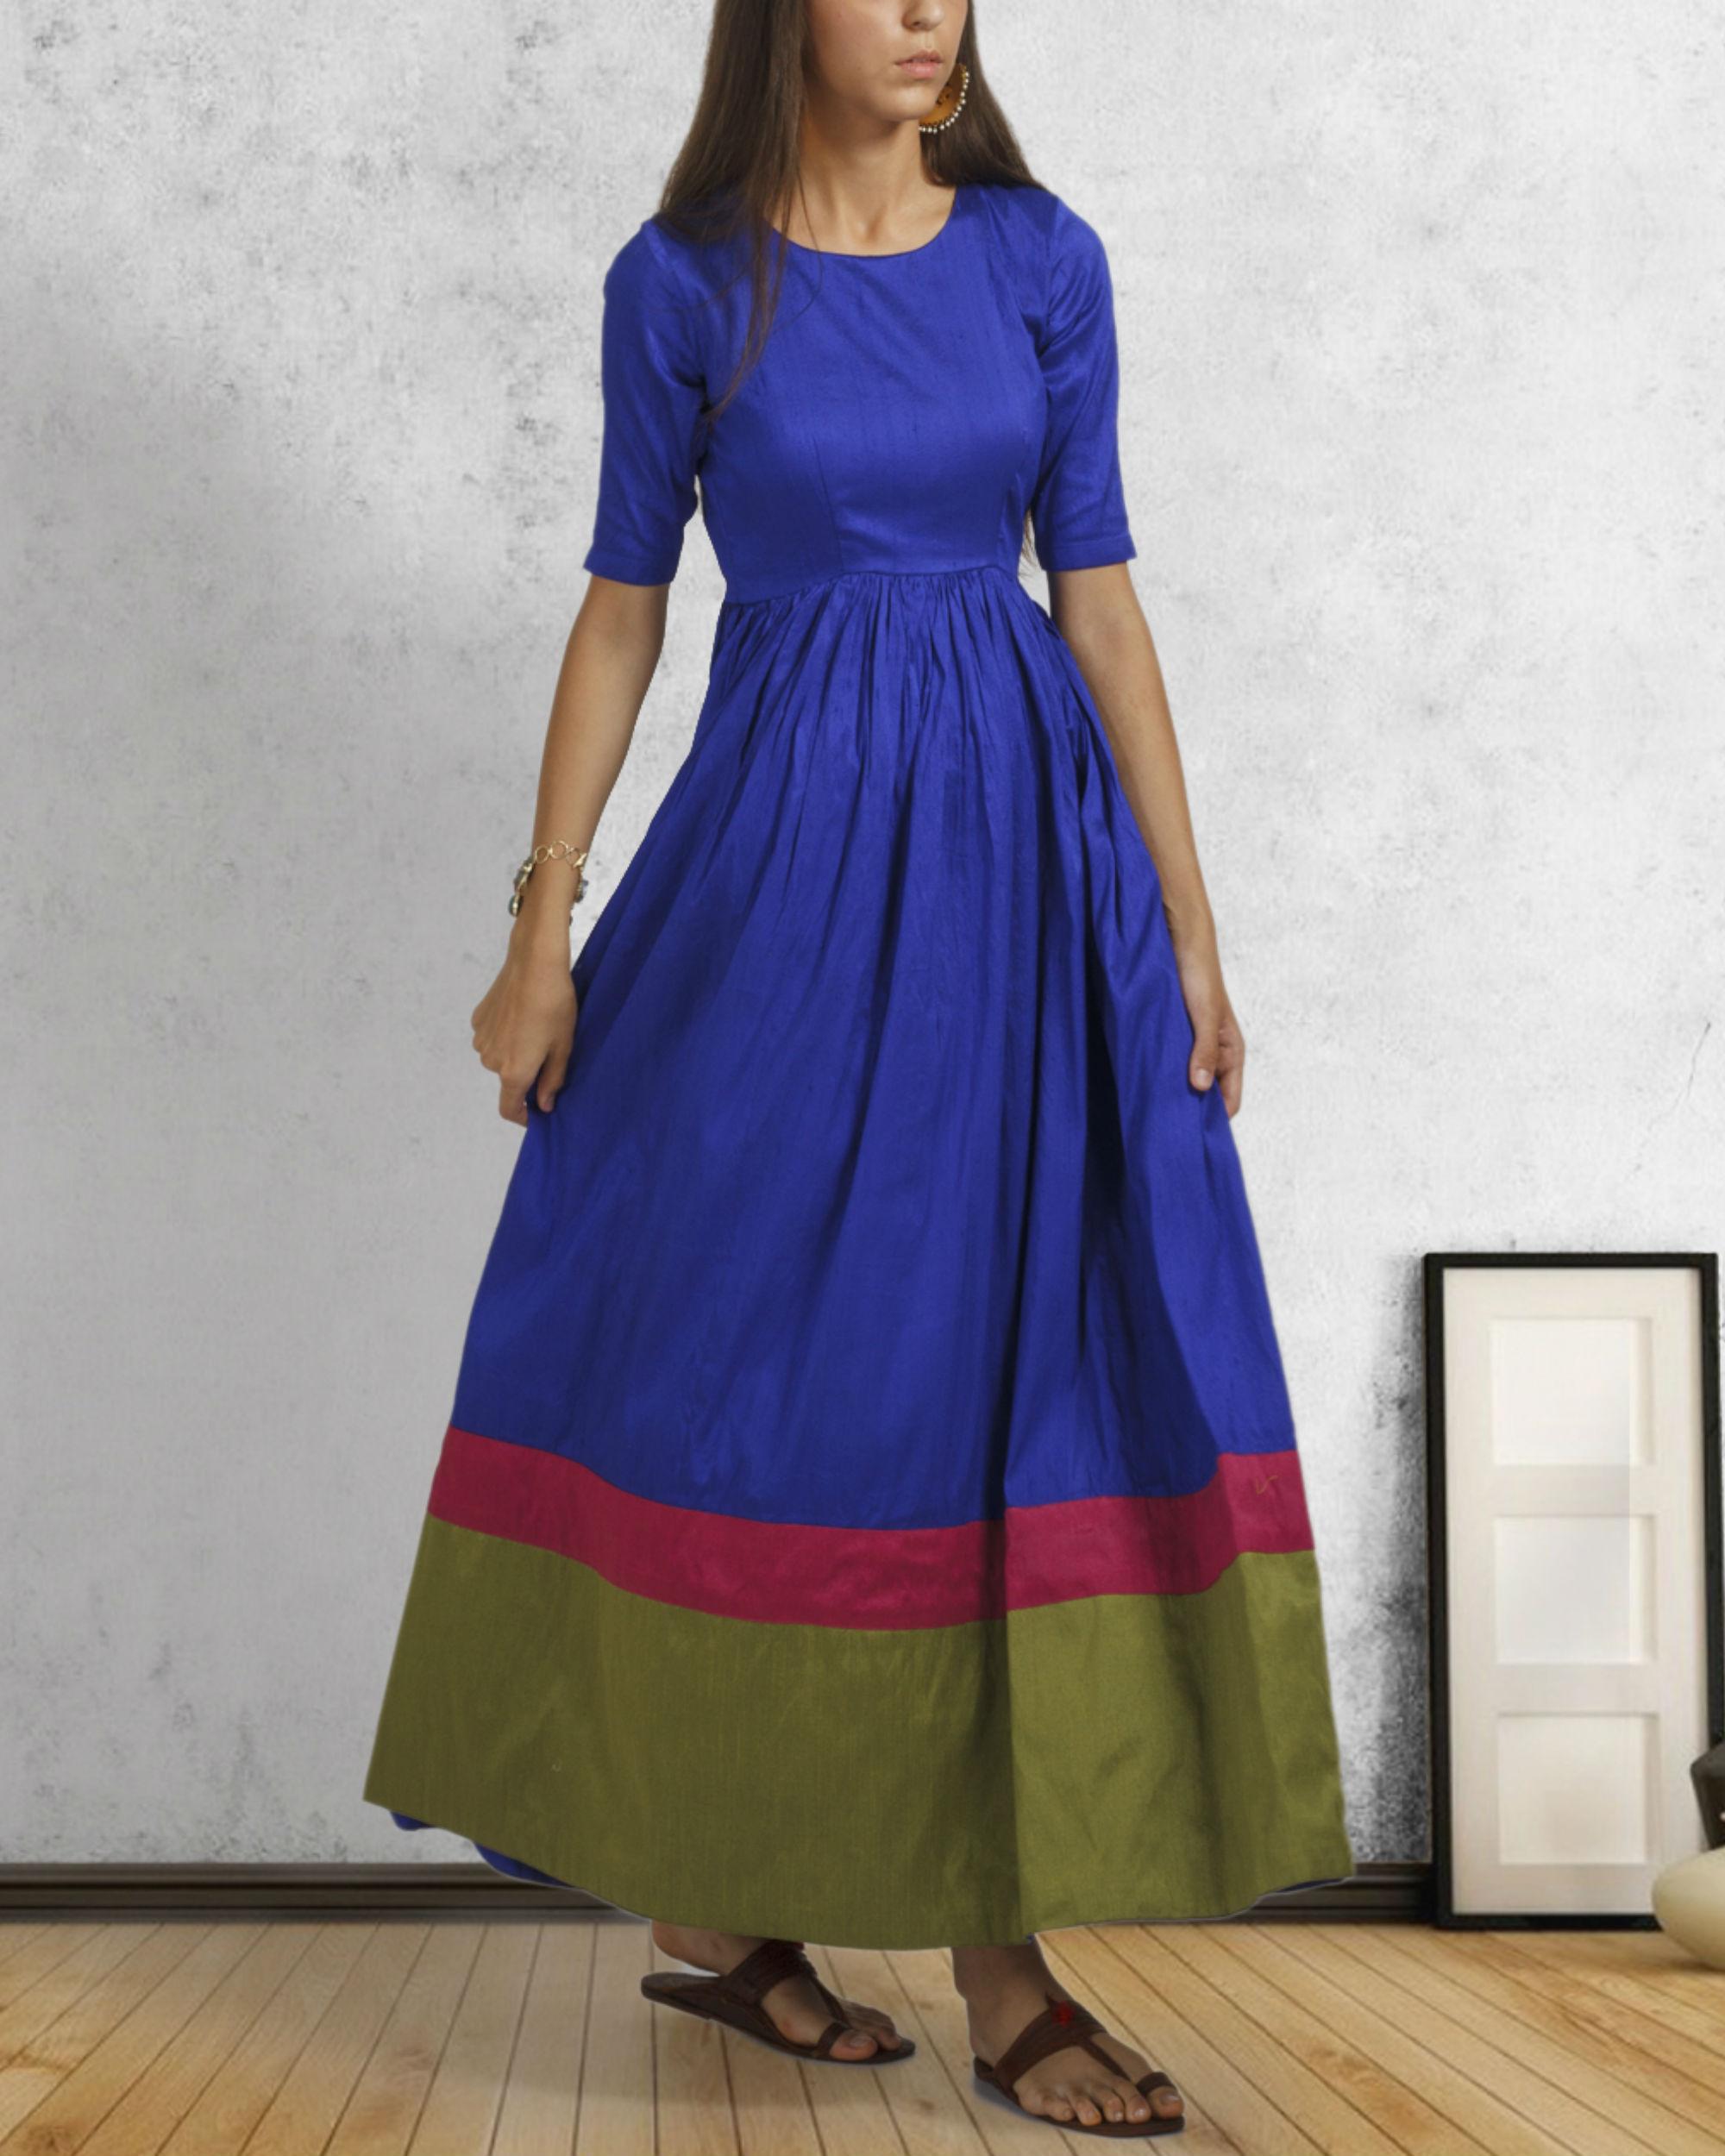 Royal blue double border dress